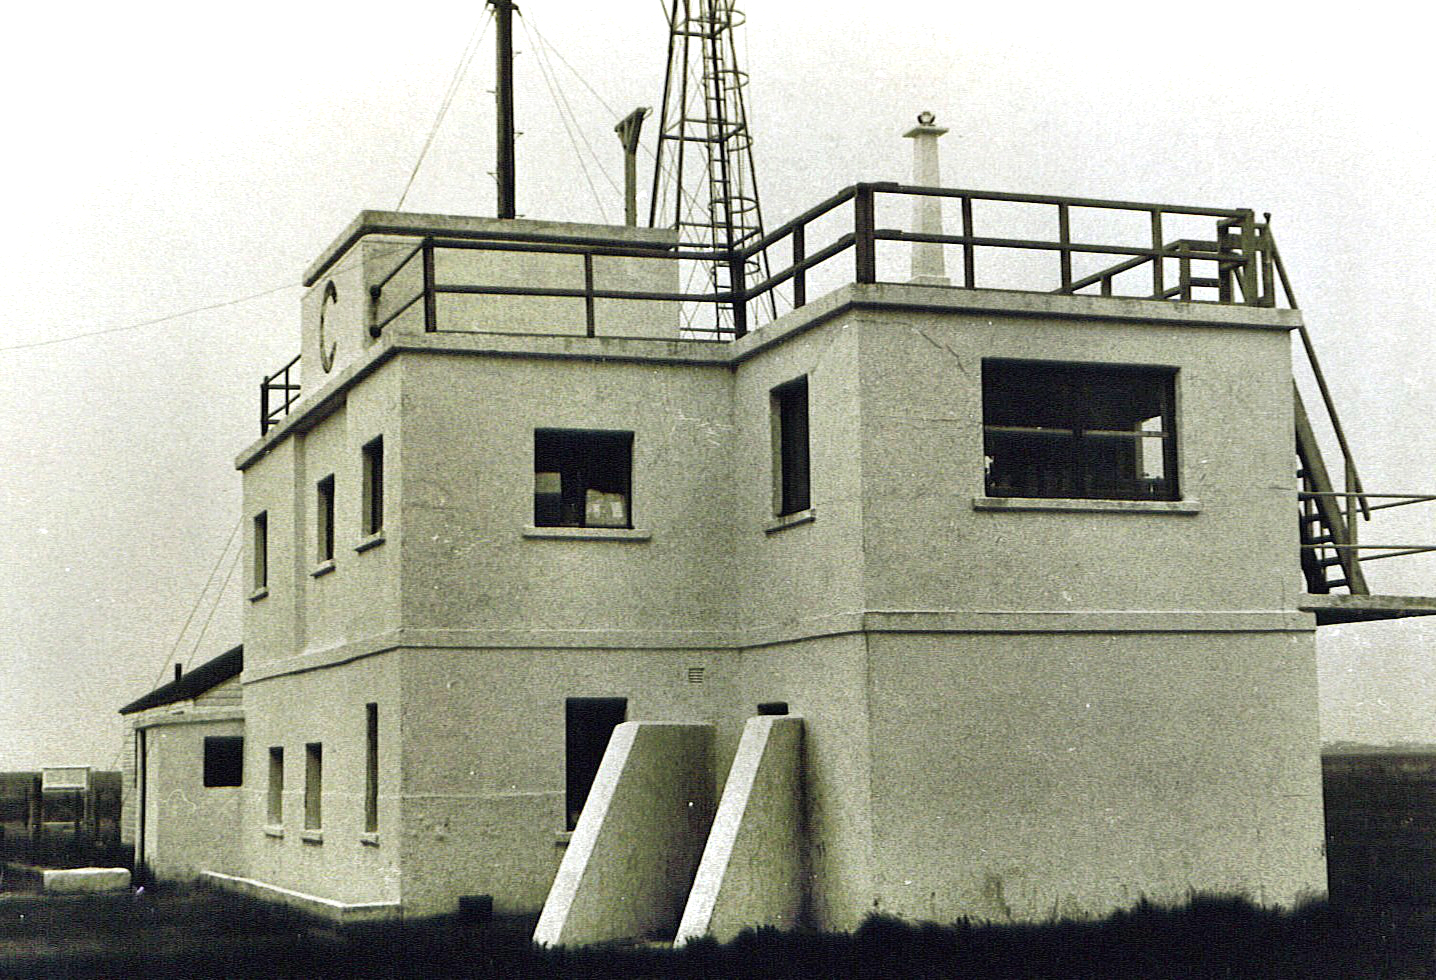 53. tiree tower